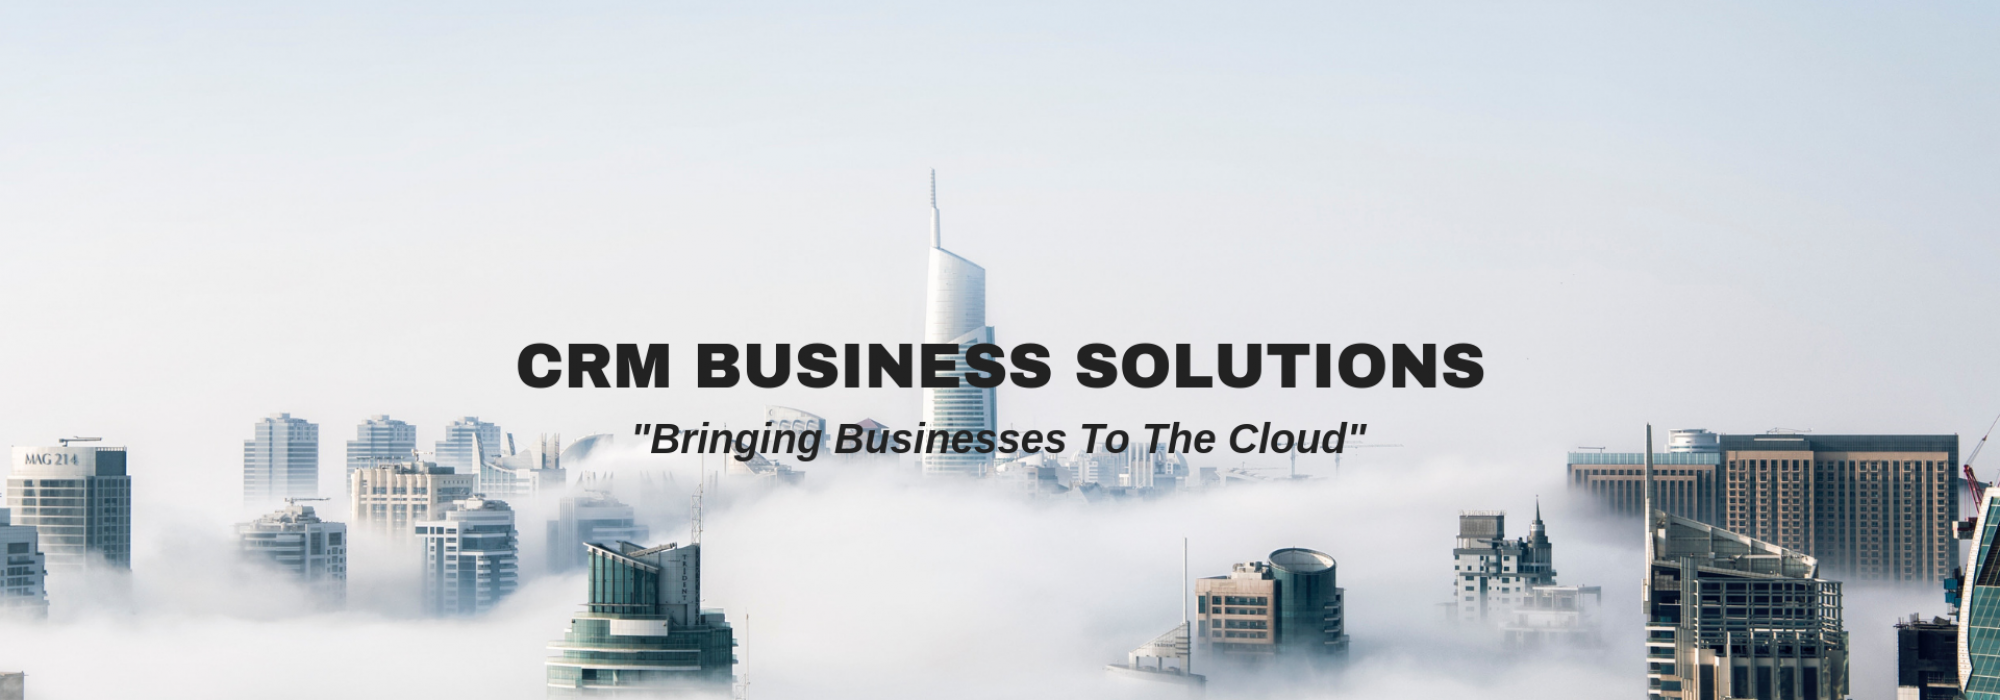 CRM BUSINESS SOLUTIUONS 6